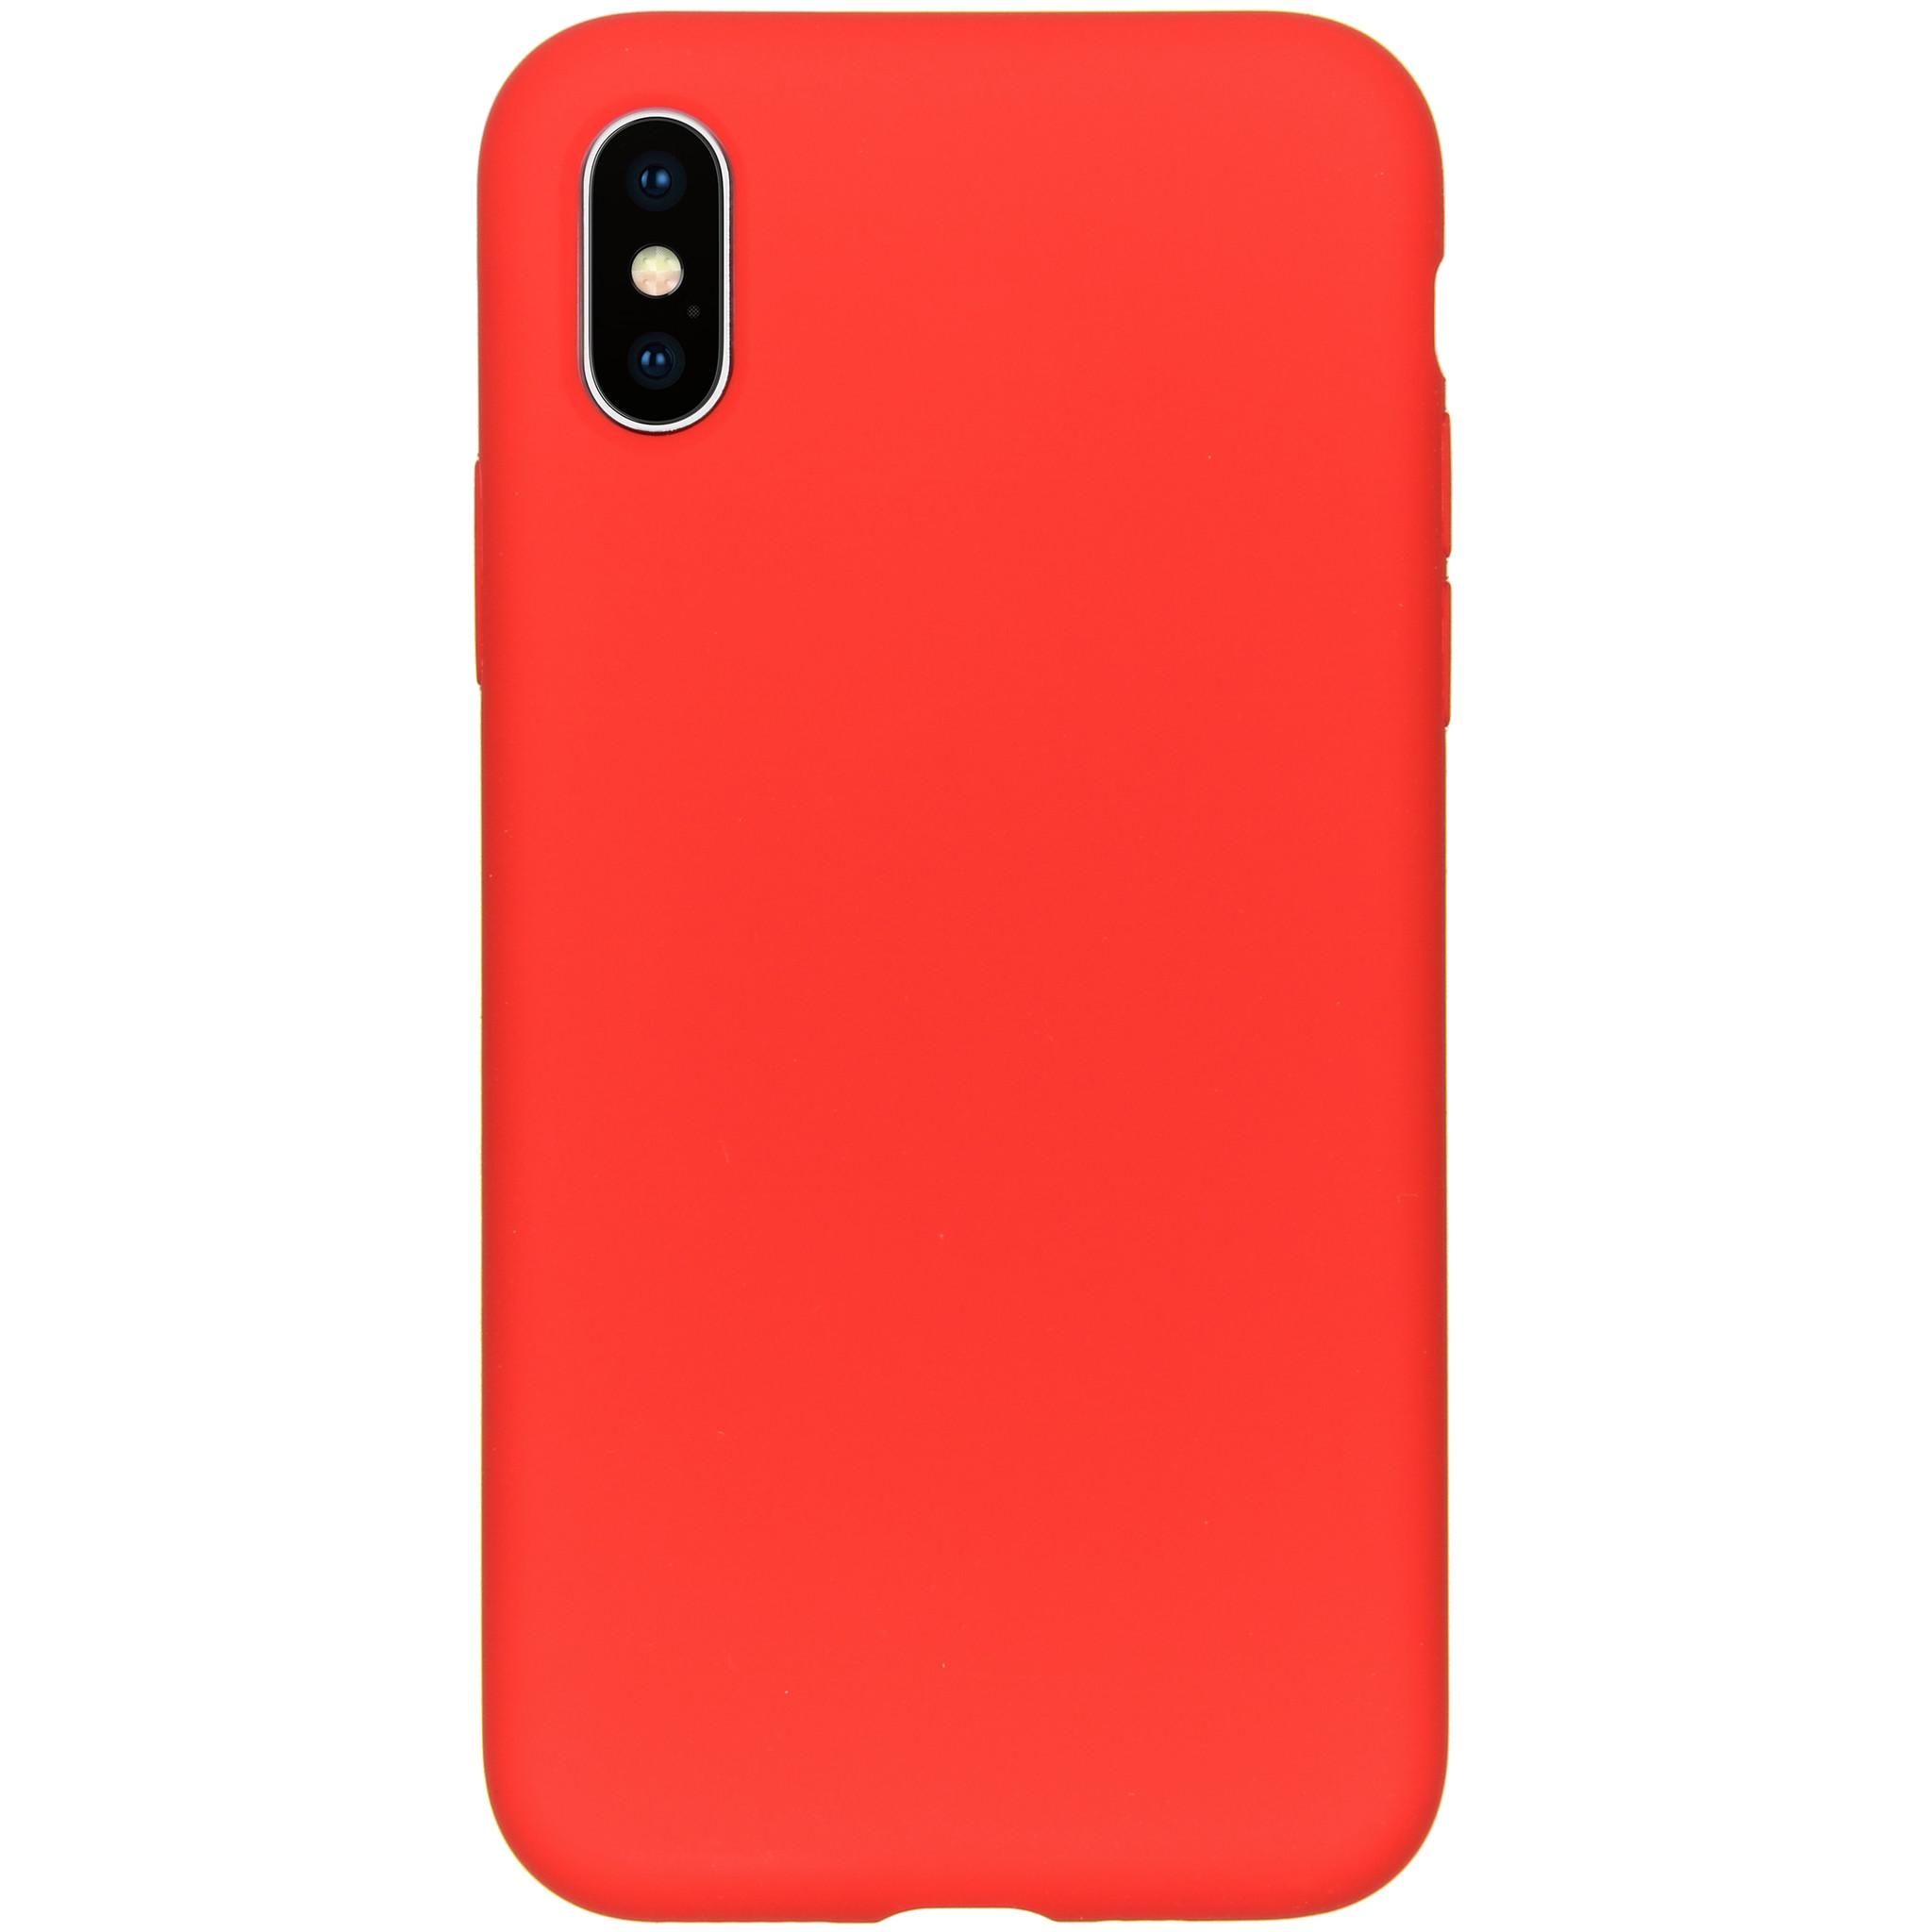 Accezz Liquid Silikoncase Rot für das iPhone Xs / X